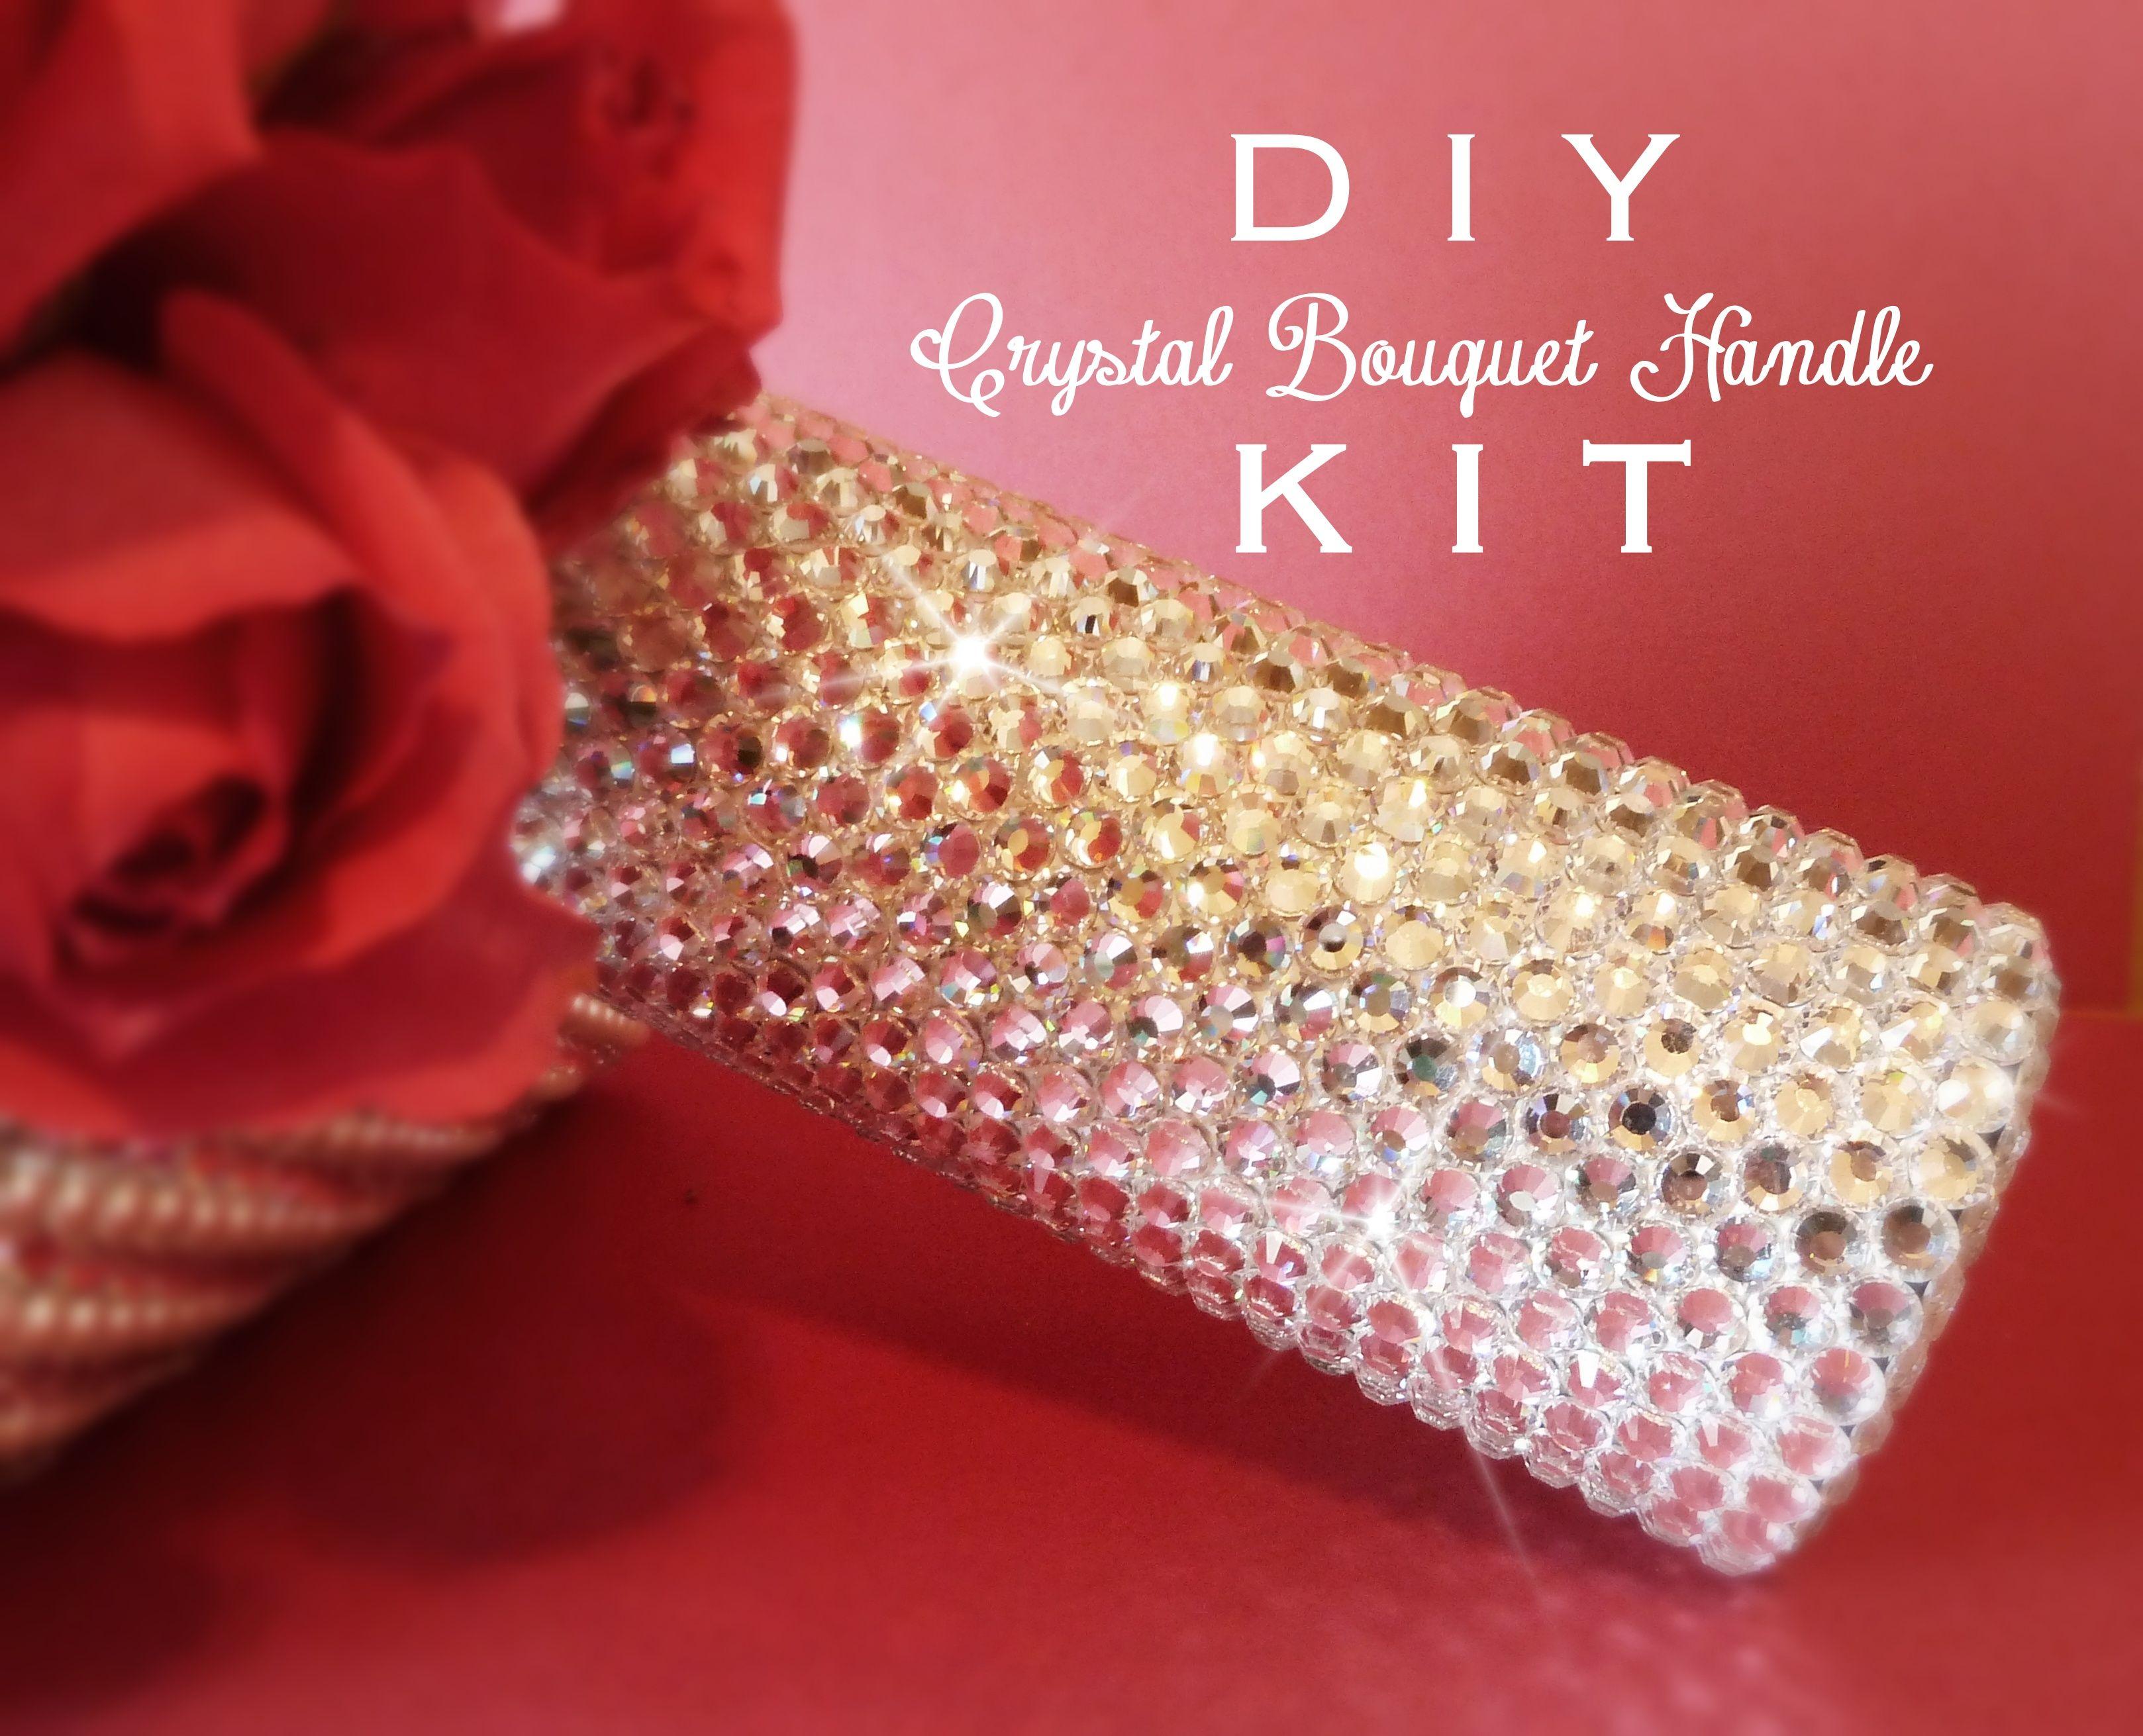 Diy Crystal Bridal Bouquet Handle Holder Kit For The Bride